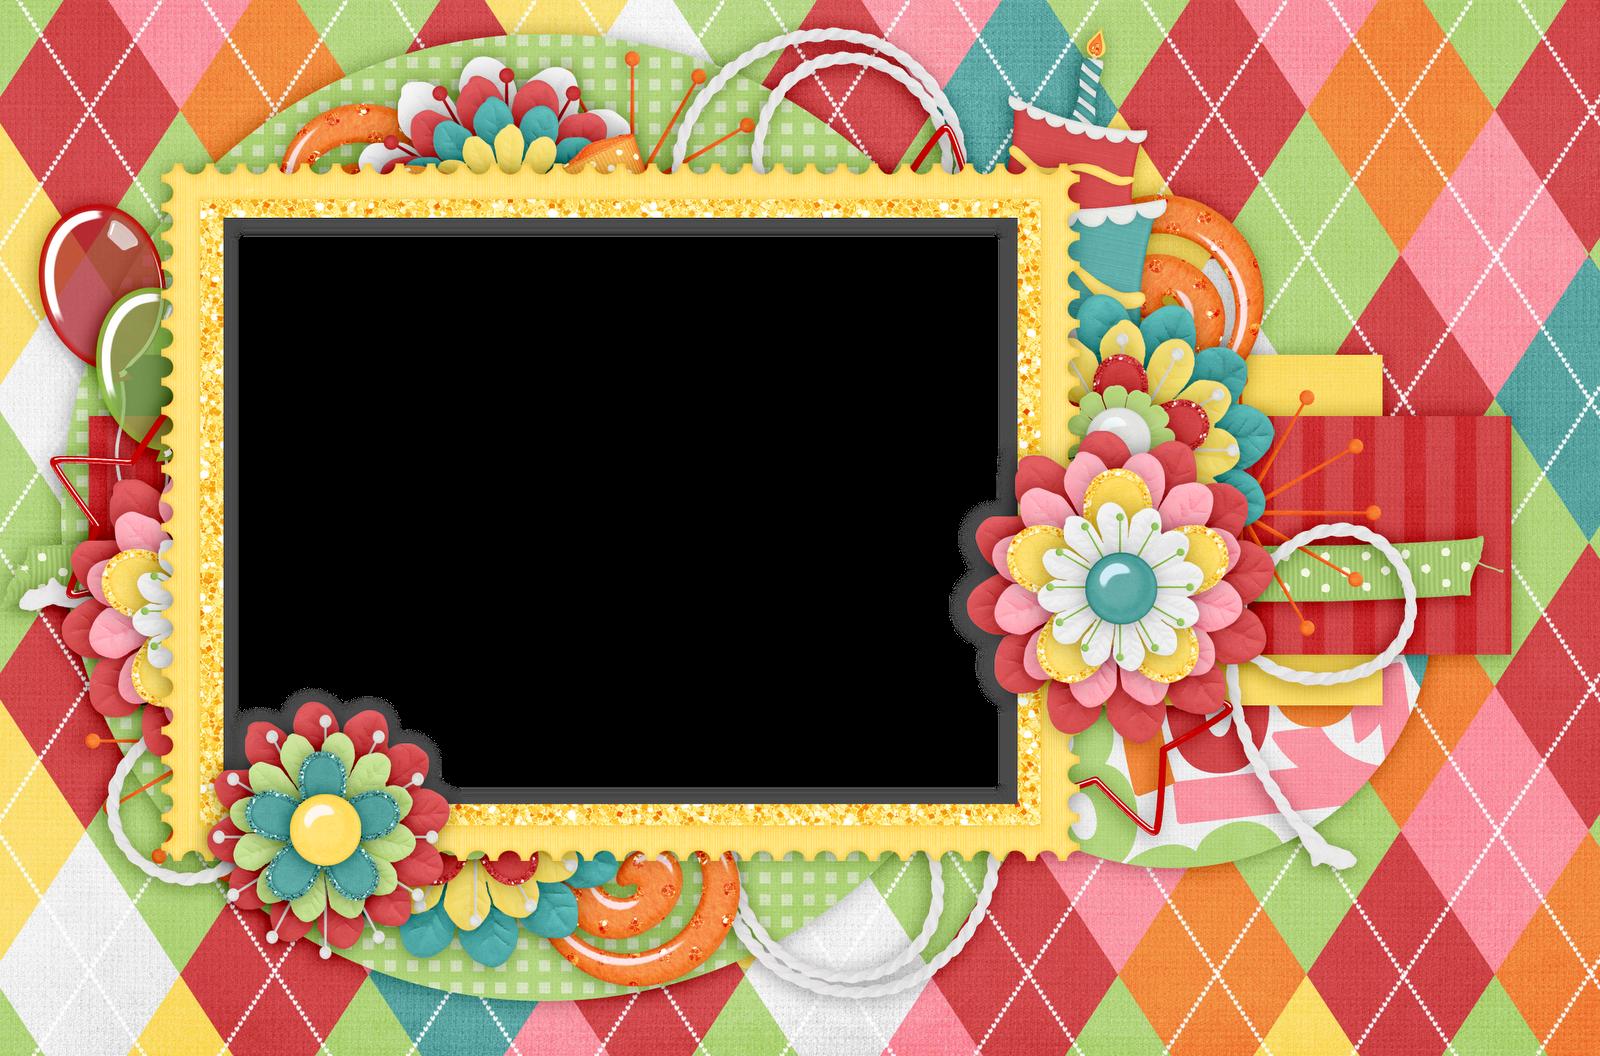 Marcos png para hacer tarjetas de cumplea os o decorar for Fotografia cuadros decoracion